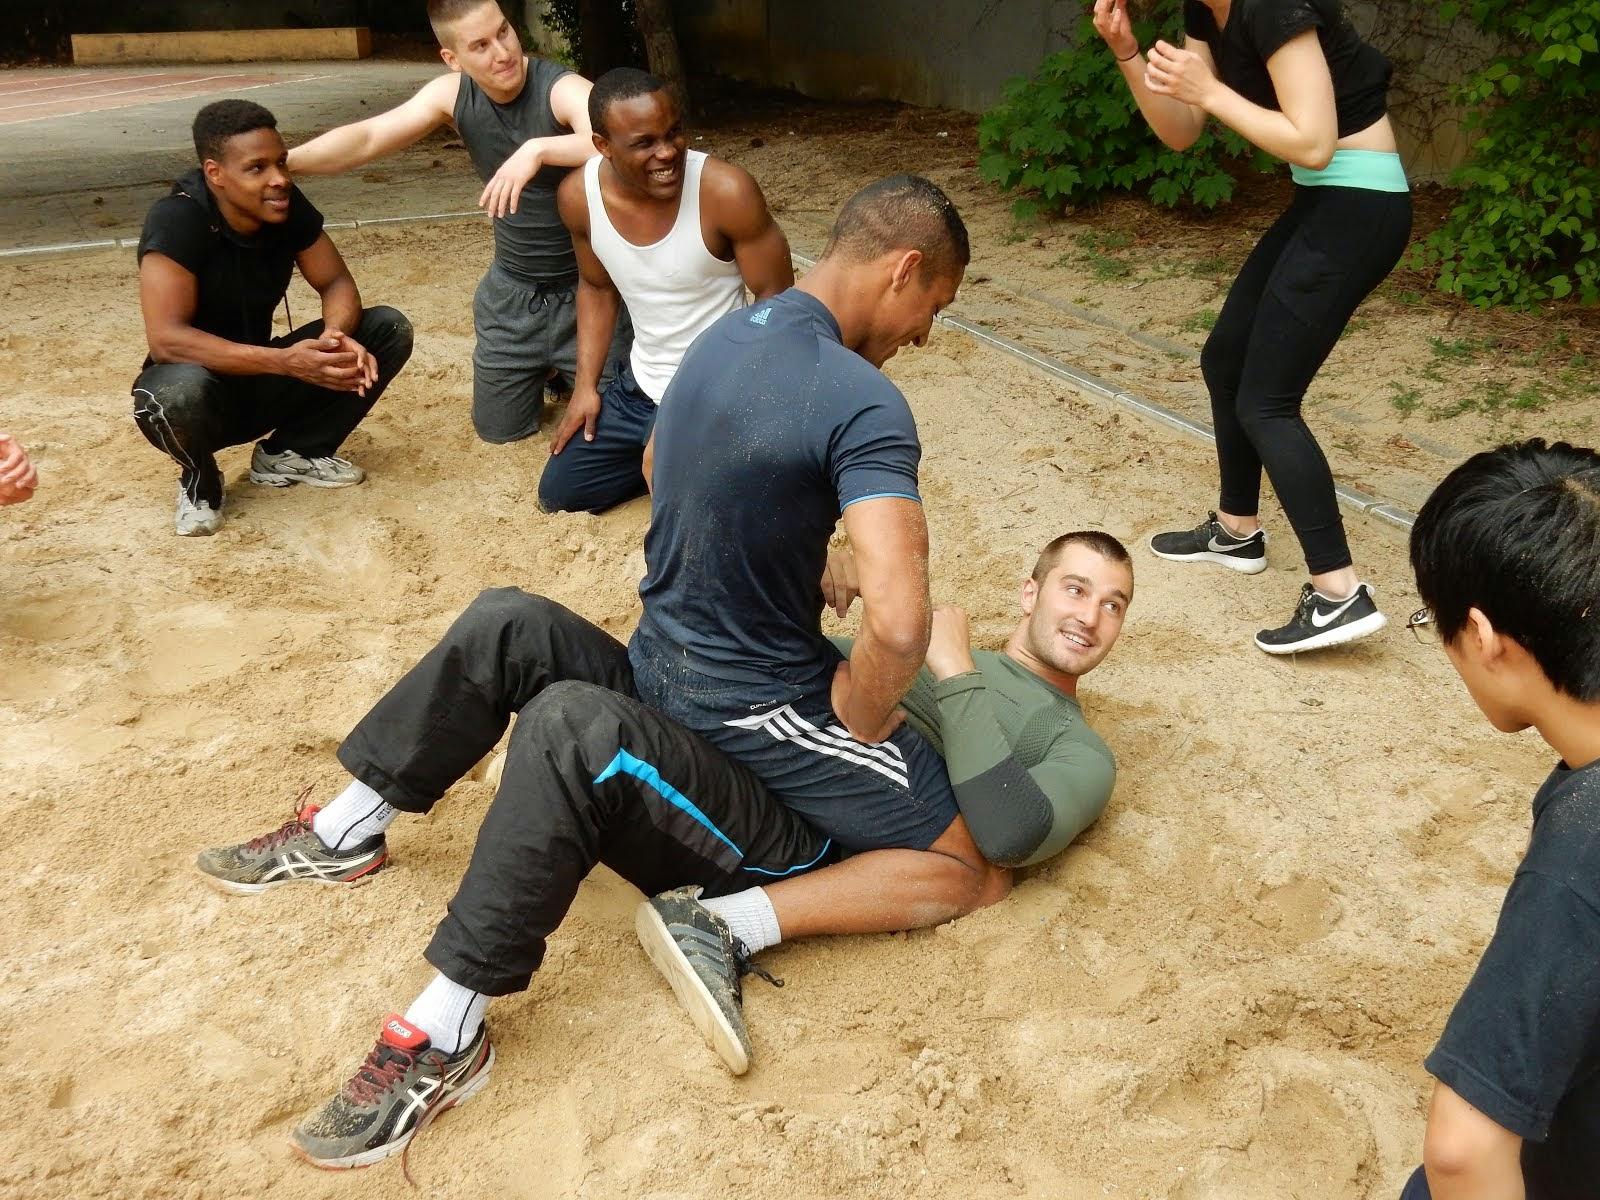 Boot camp - Combat rapproché